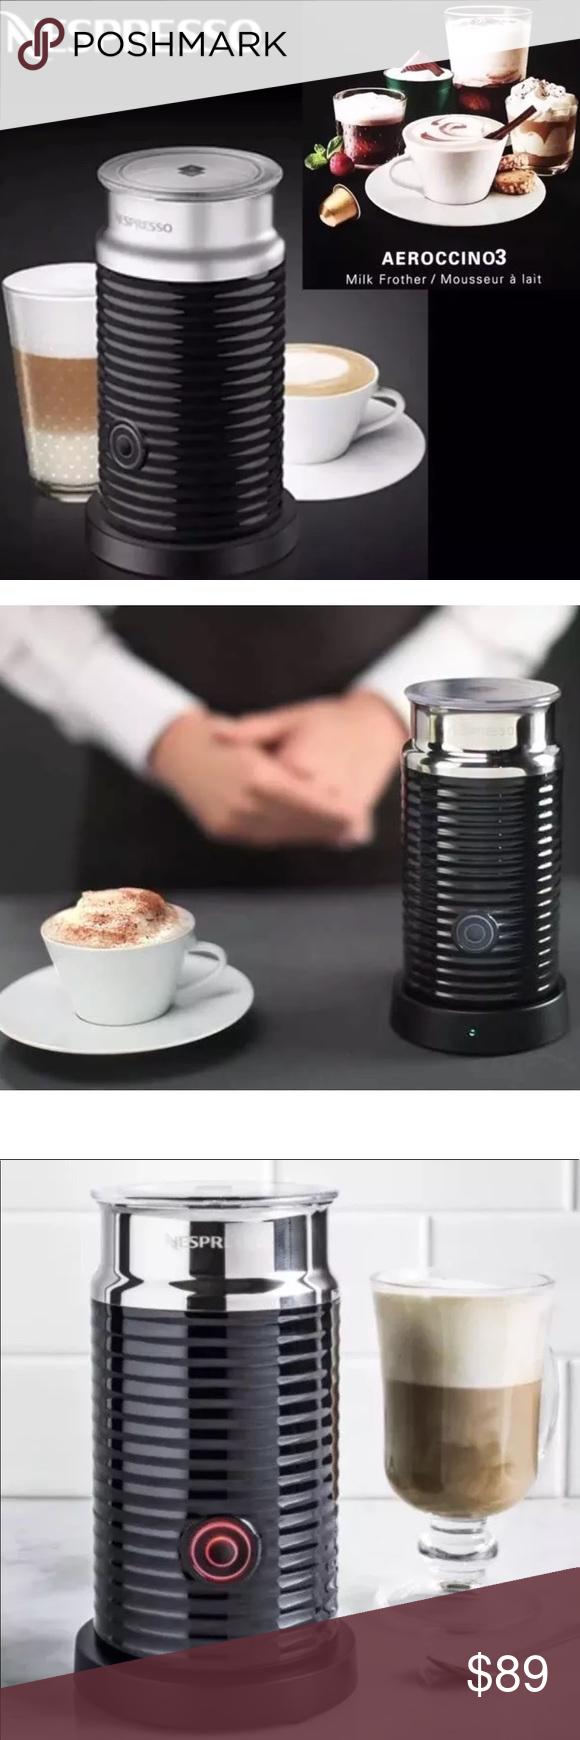 Nespresso Aeroccino Automatic Milk Frother - NEW ...